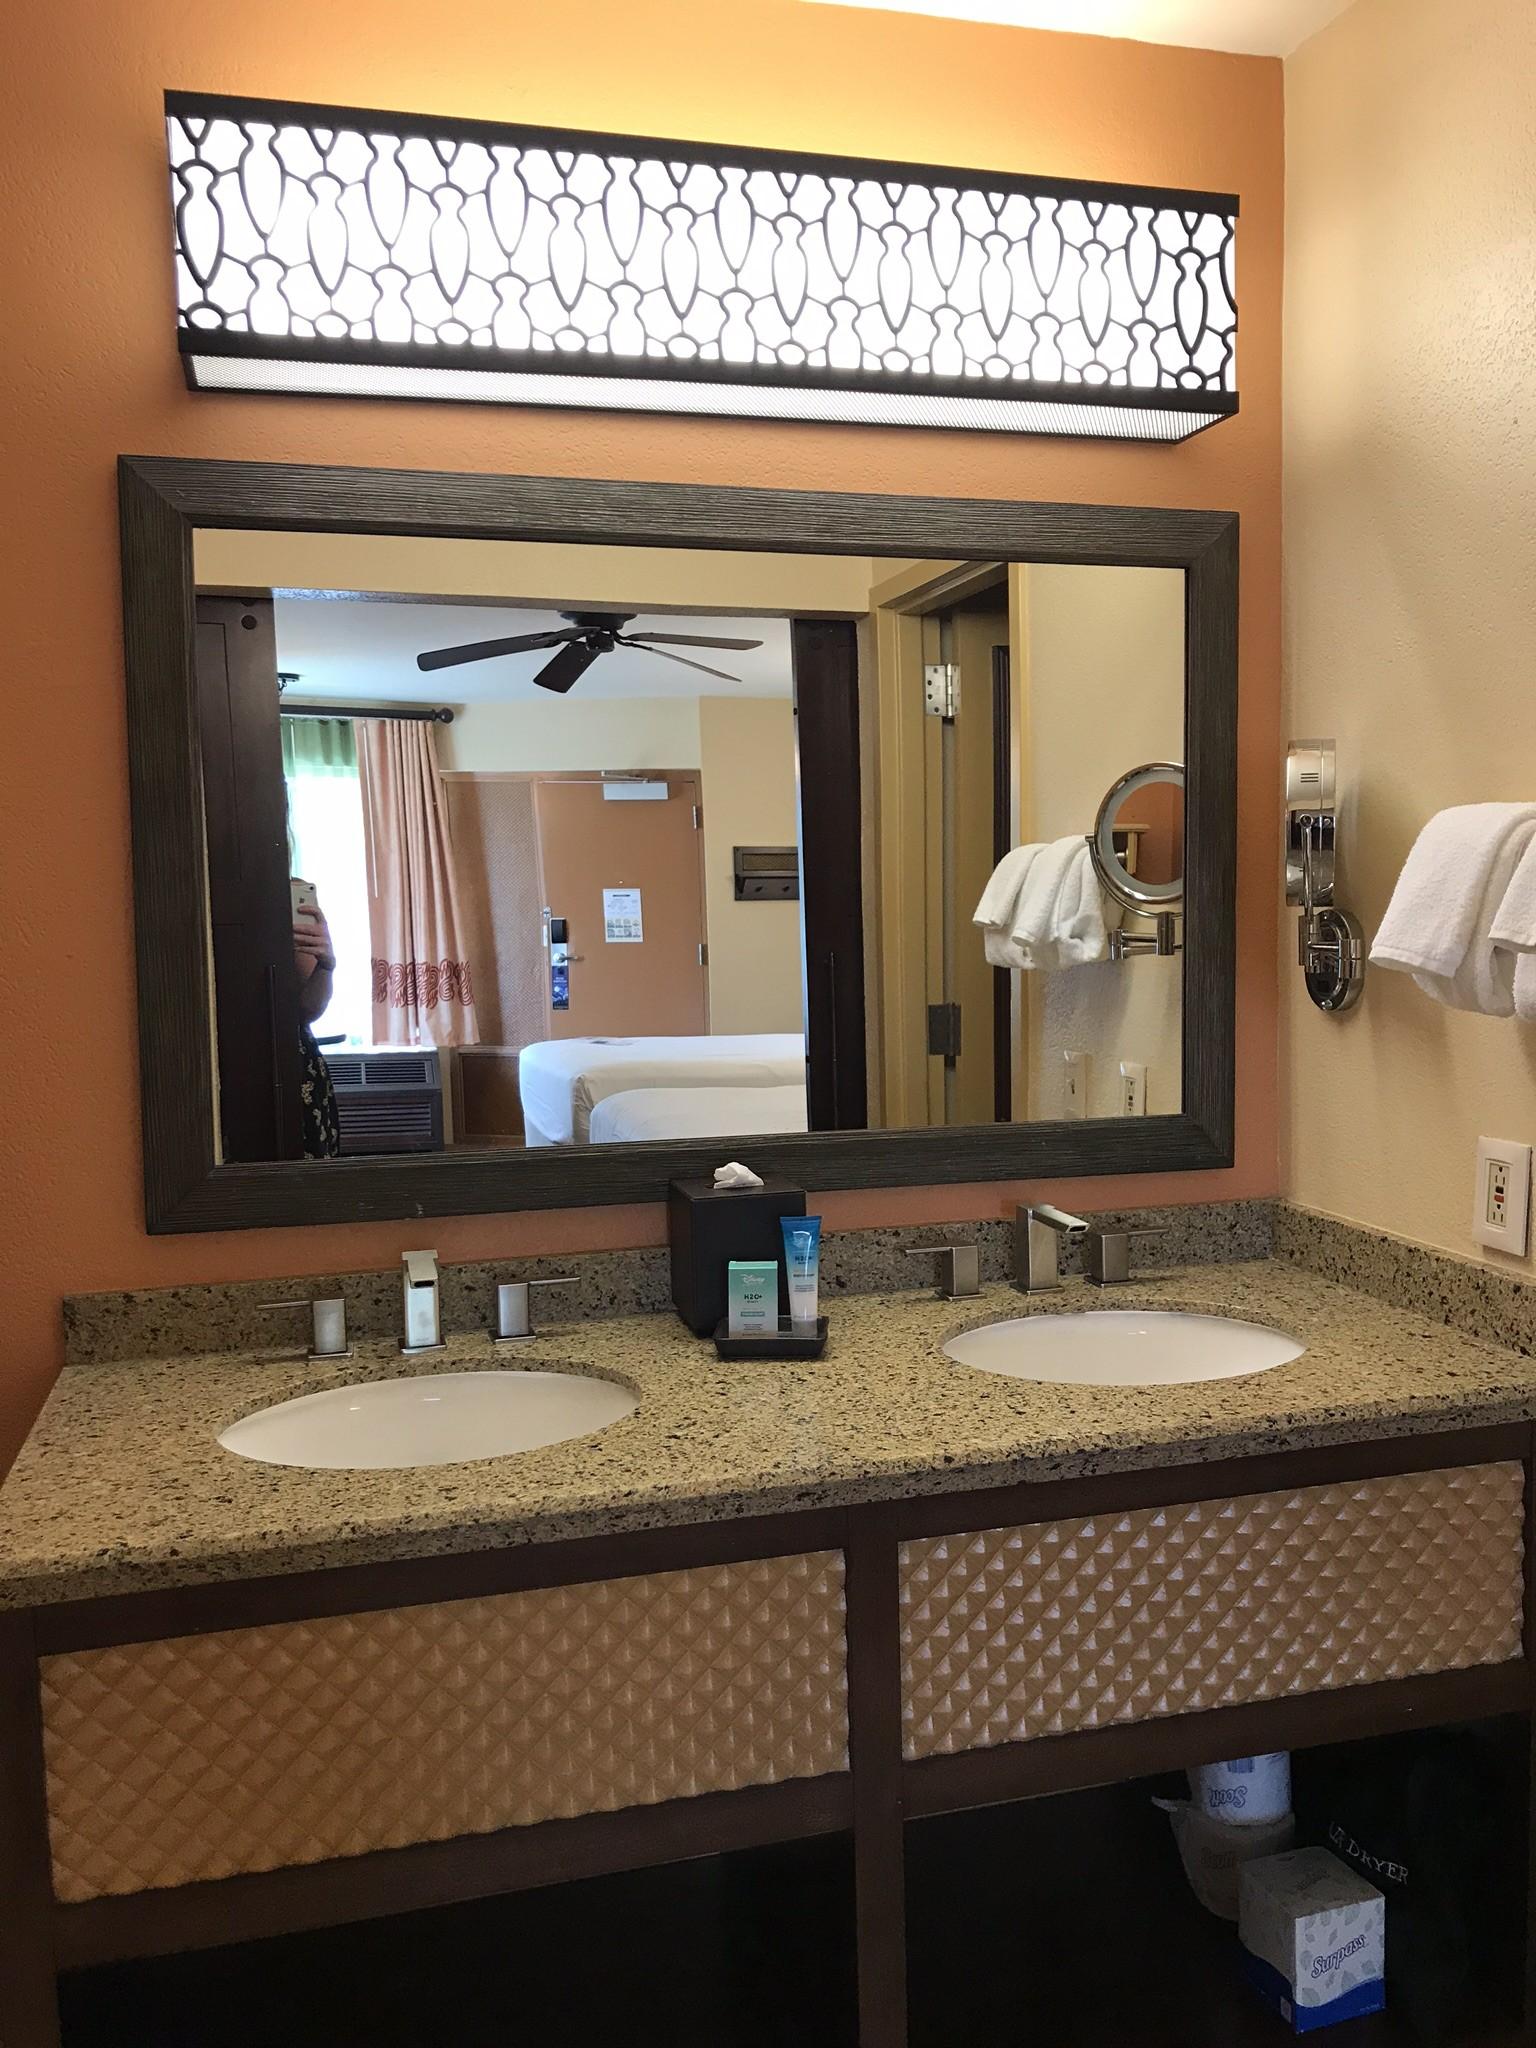 in-room bathroom vanity and double sink